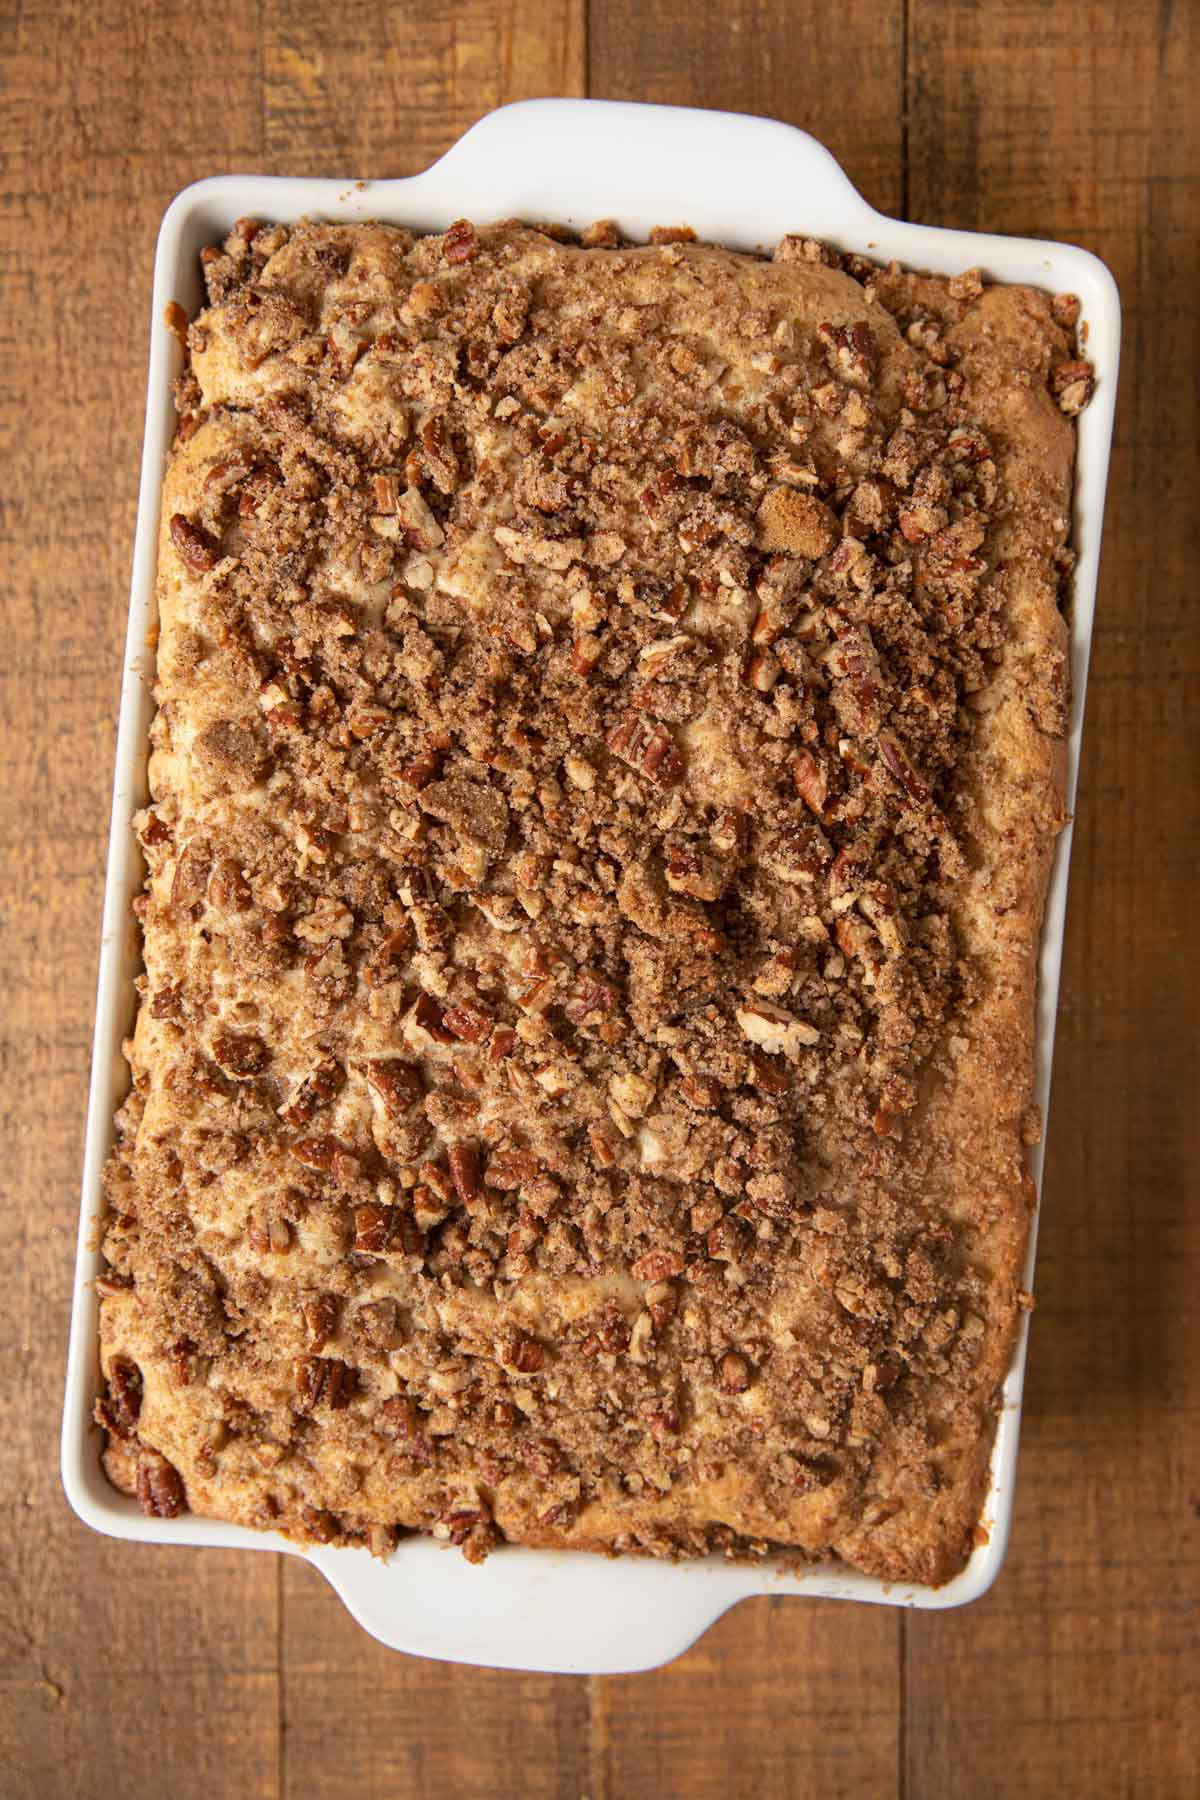 Sour Cream Coffee Cake in baking dish